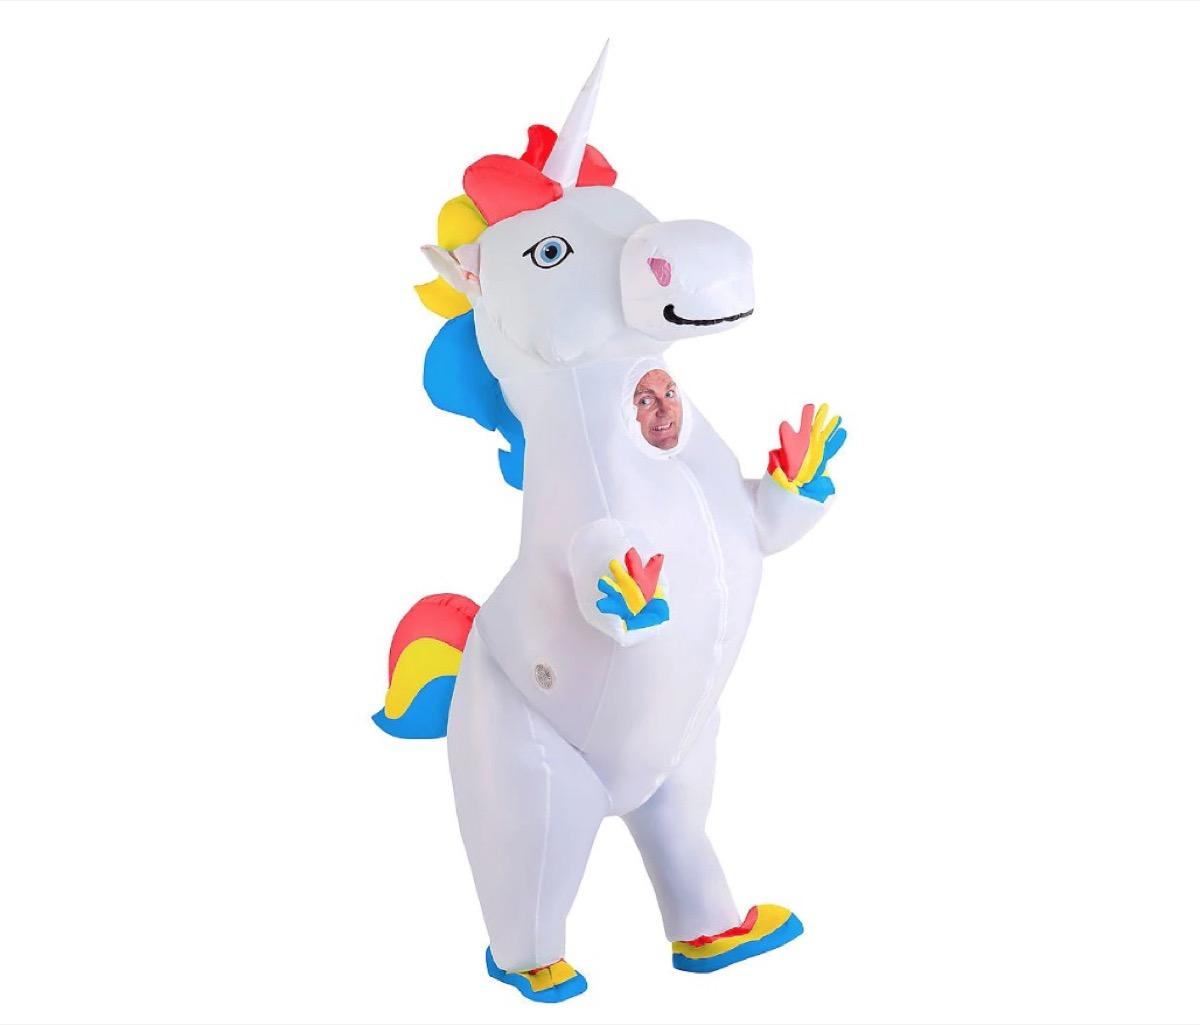 inflatable unicorn costume, best halloween costumes